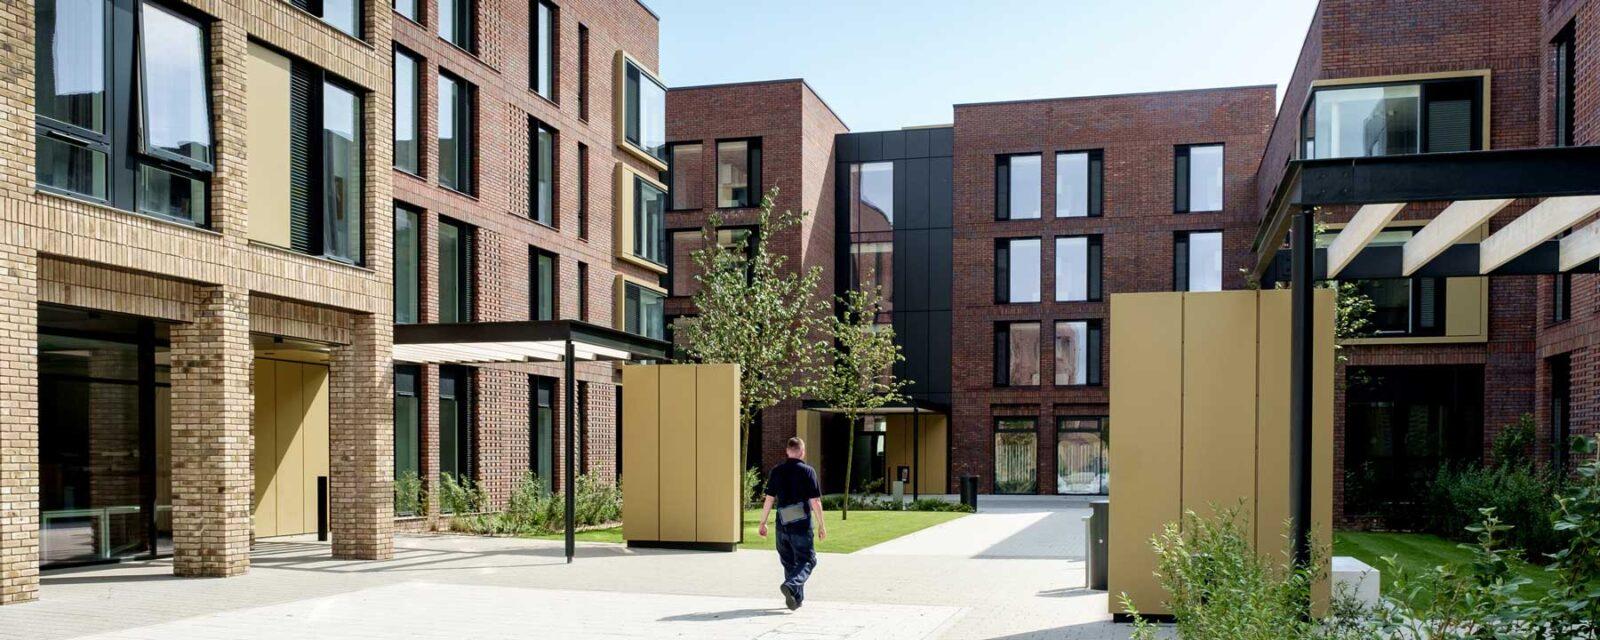 AUB Residentials Halls Exterior Courtyard View